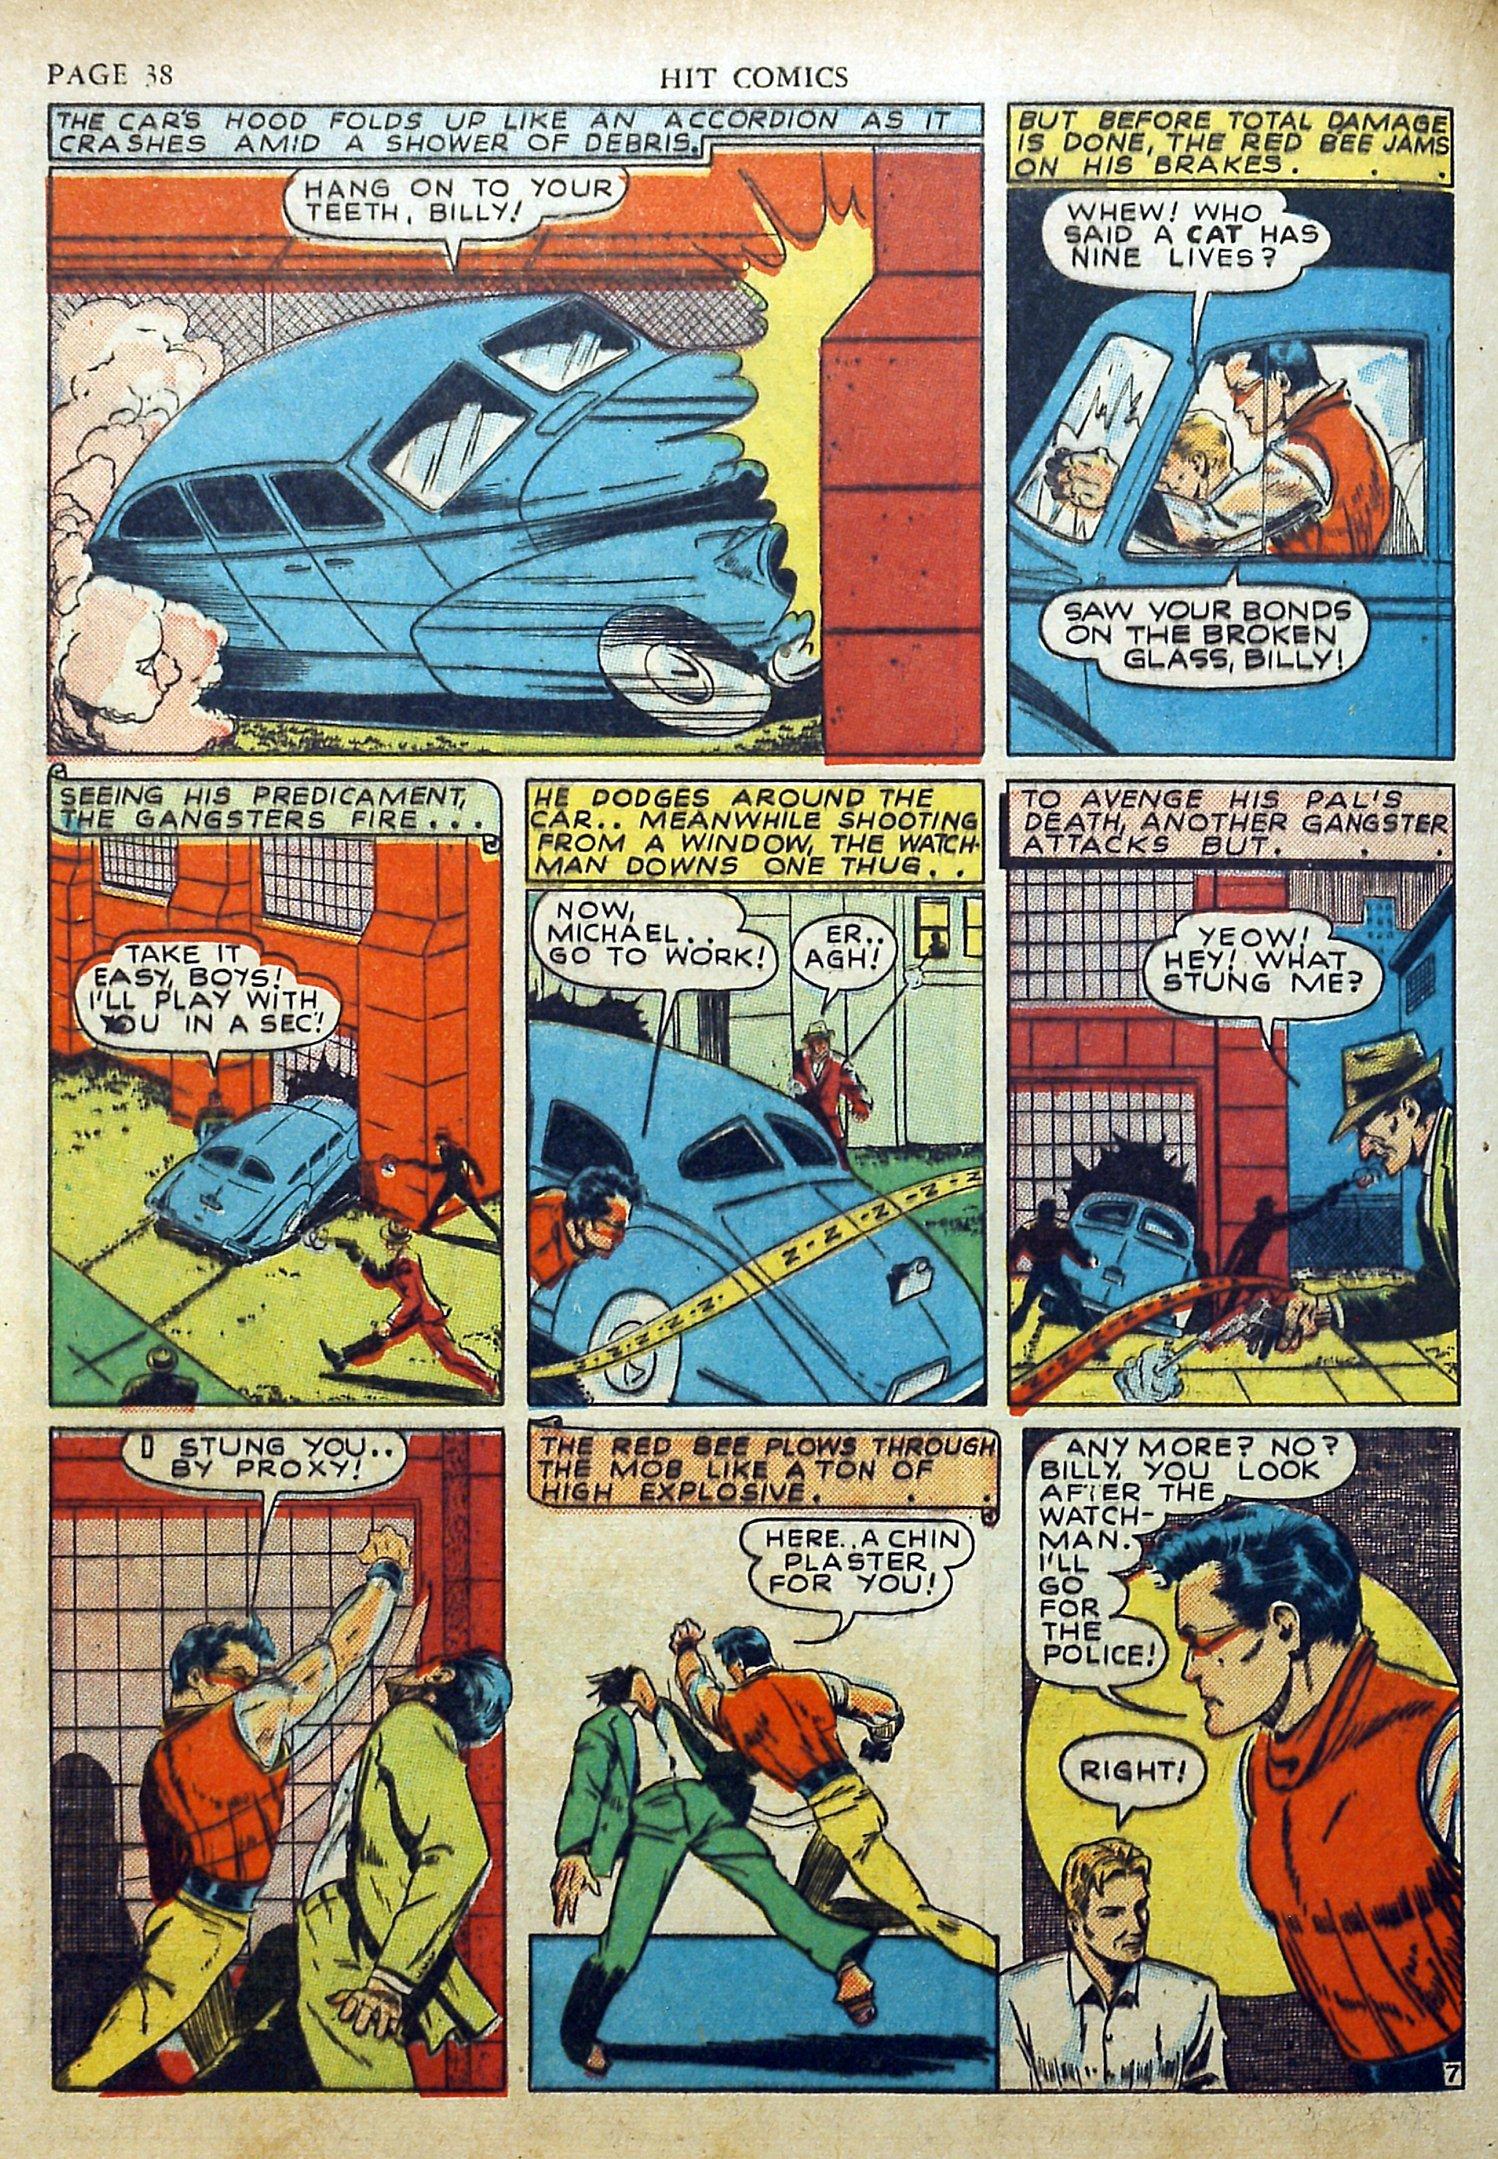 Read online Hit Comics comic -  Issue #17 - 40